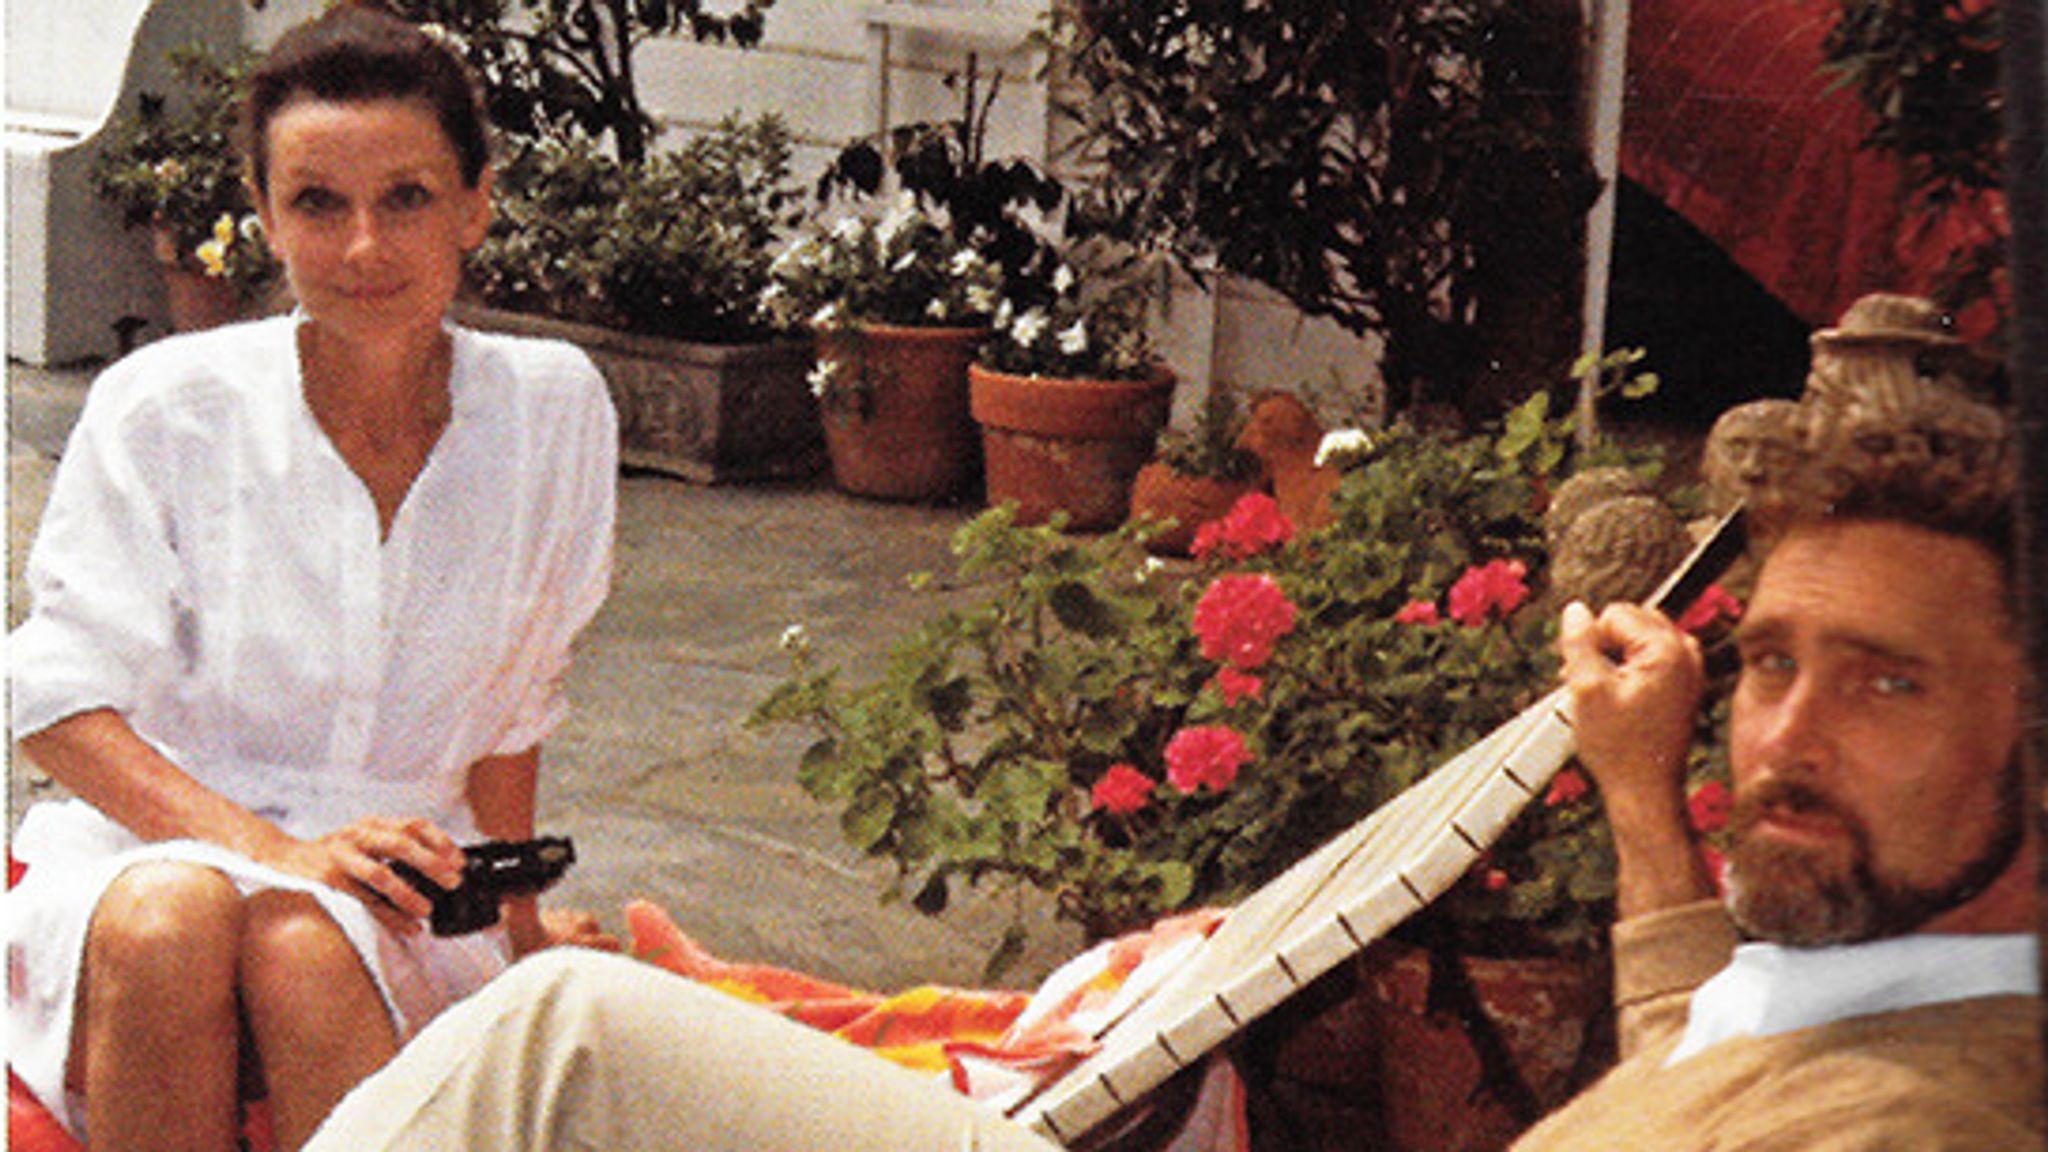 Audrey Hepburn, Robert Wolders. Pic: Connie Wald